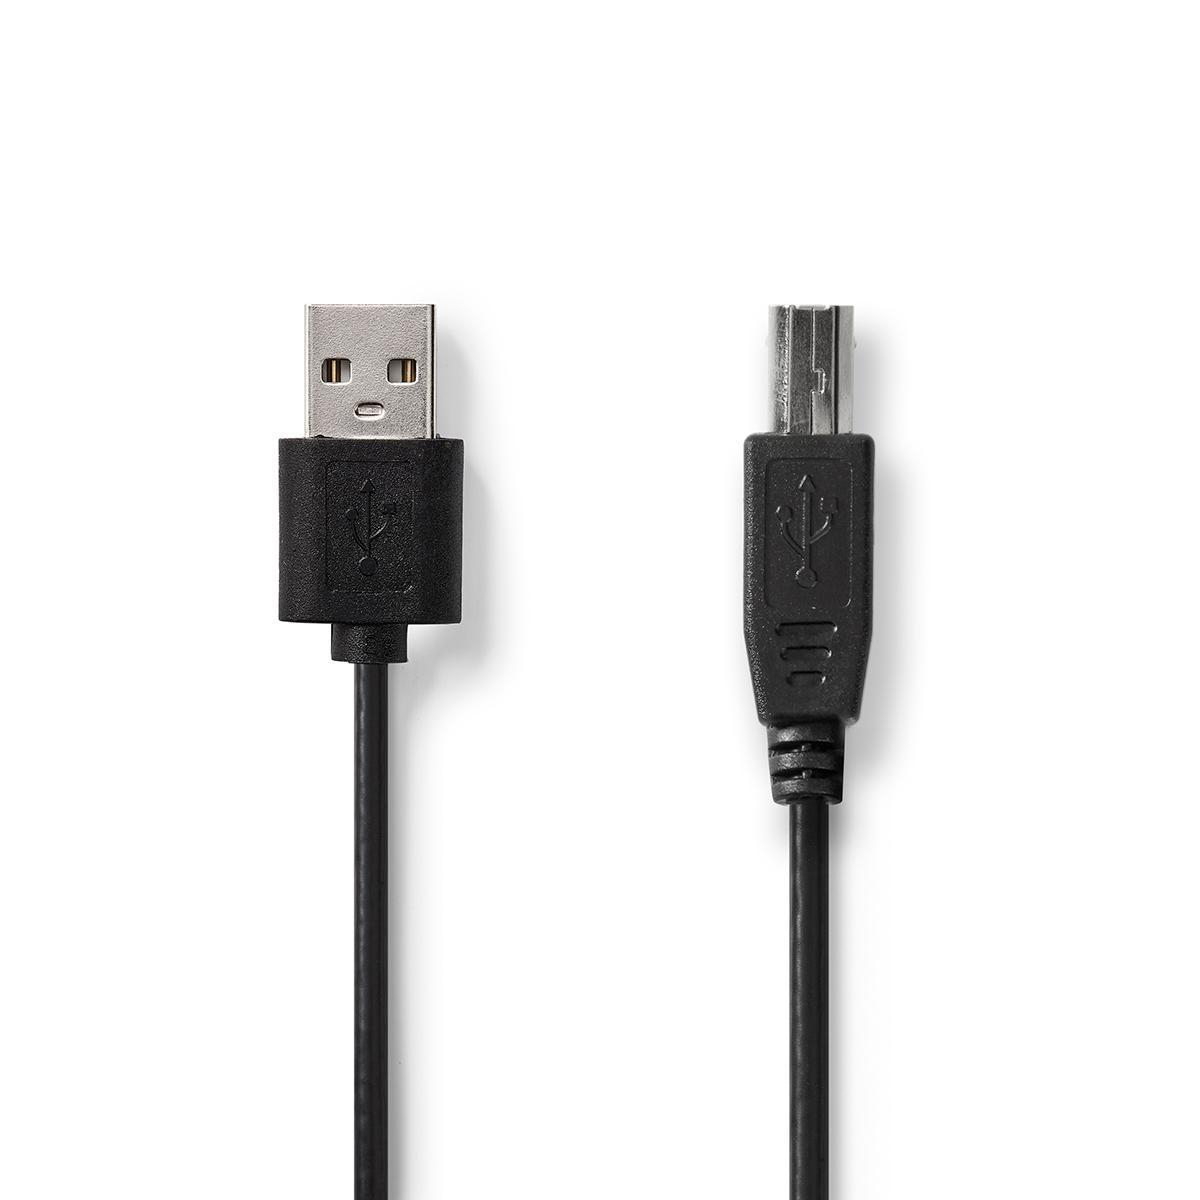 Micro USB Gigabyte Fox/® Alimentation Chargeur C/âble de charge C/âble de donn/ées /pour chargement rapide 1,5/m 5/V//2/A pour Acer Iconia One 7//One 8//One 10//Tab 7//Tab 8//Tab 10/